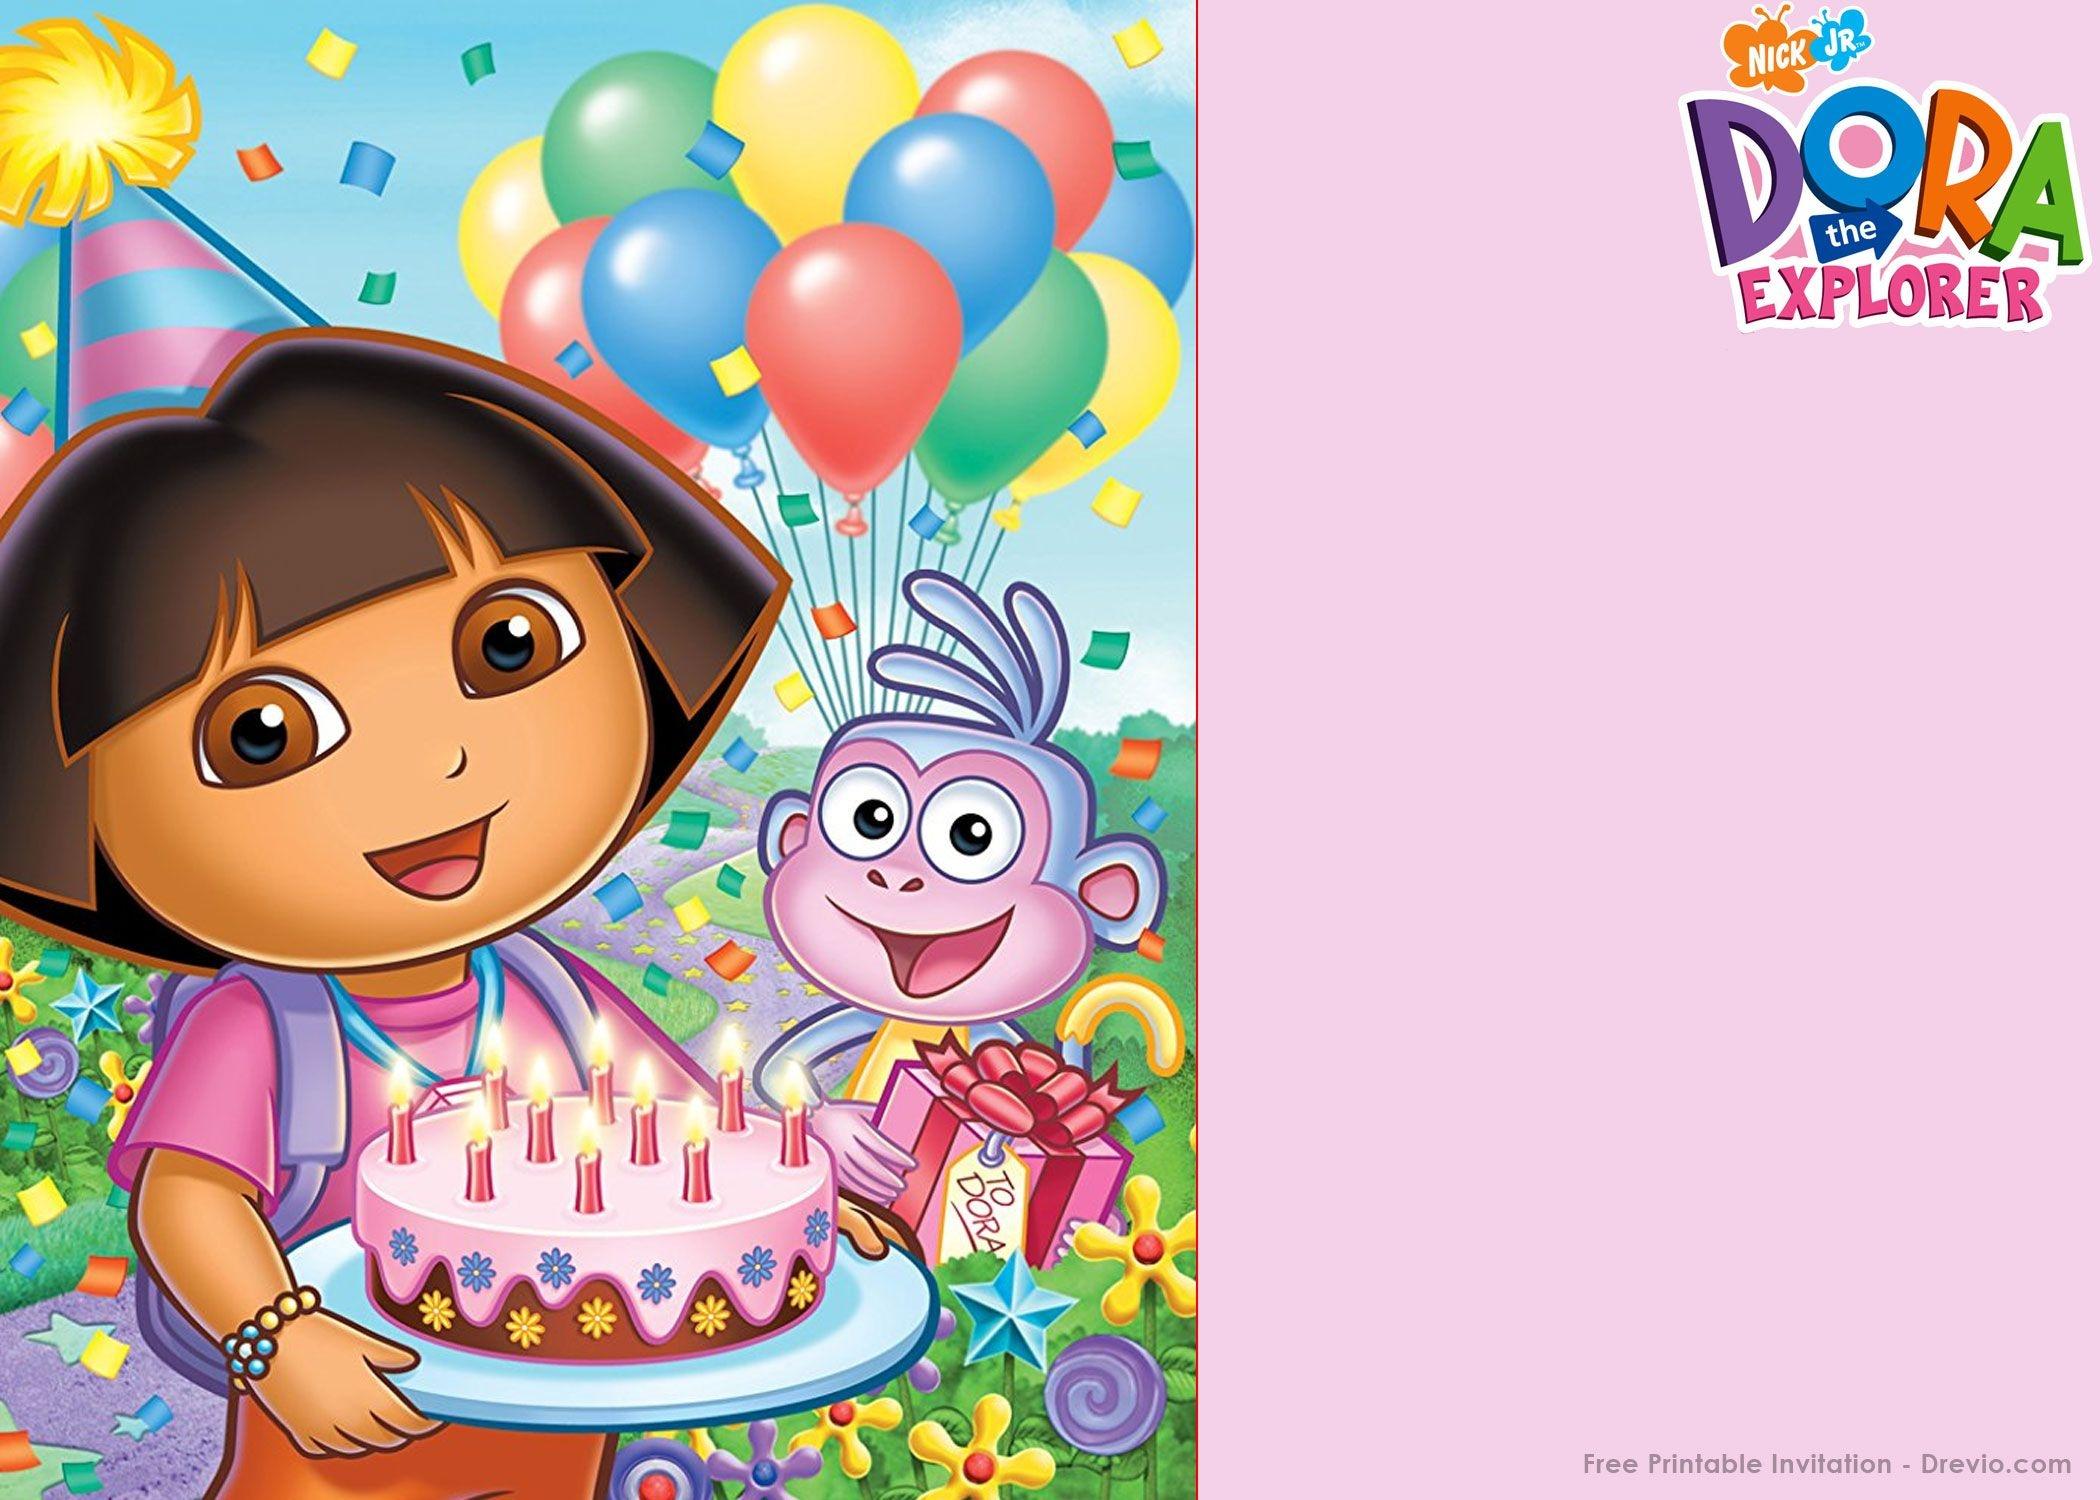 Free Printable Dora The Explorer Party Invitation | Birthday - Free Dora Party Printables